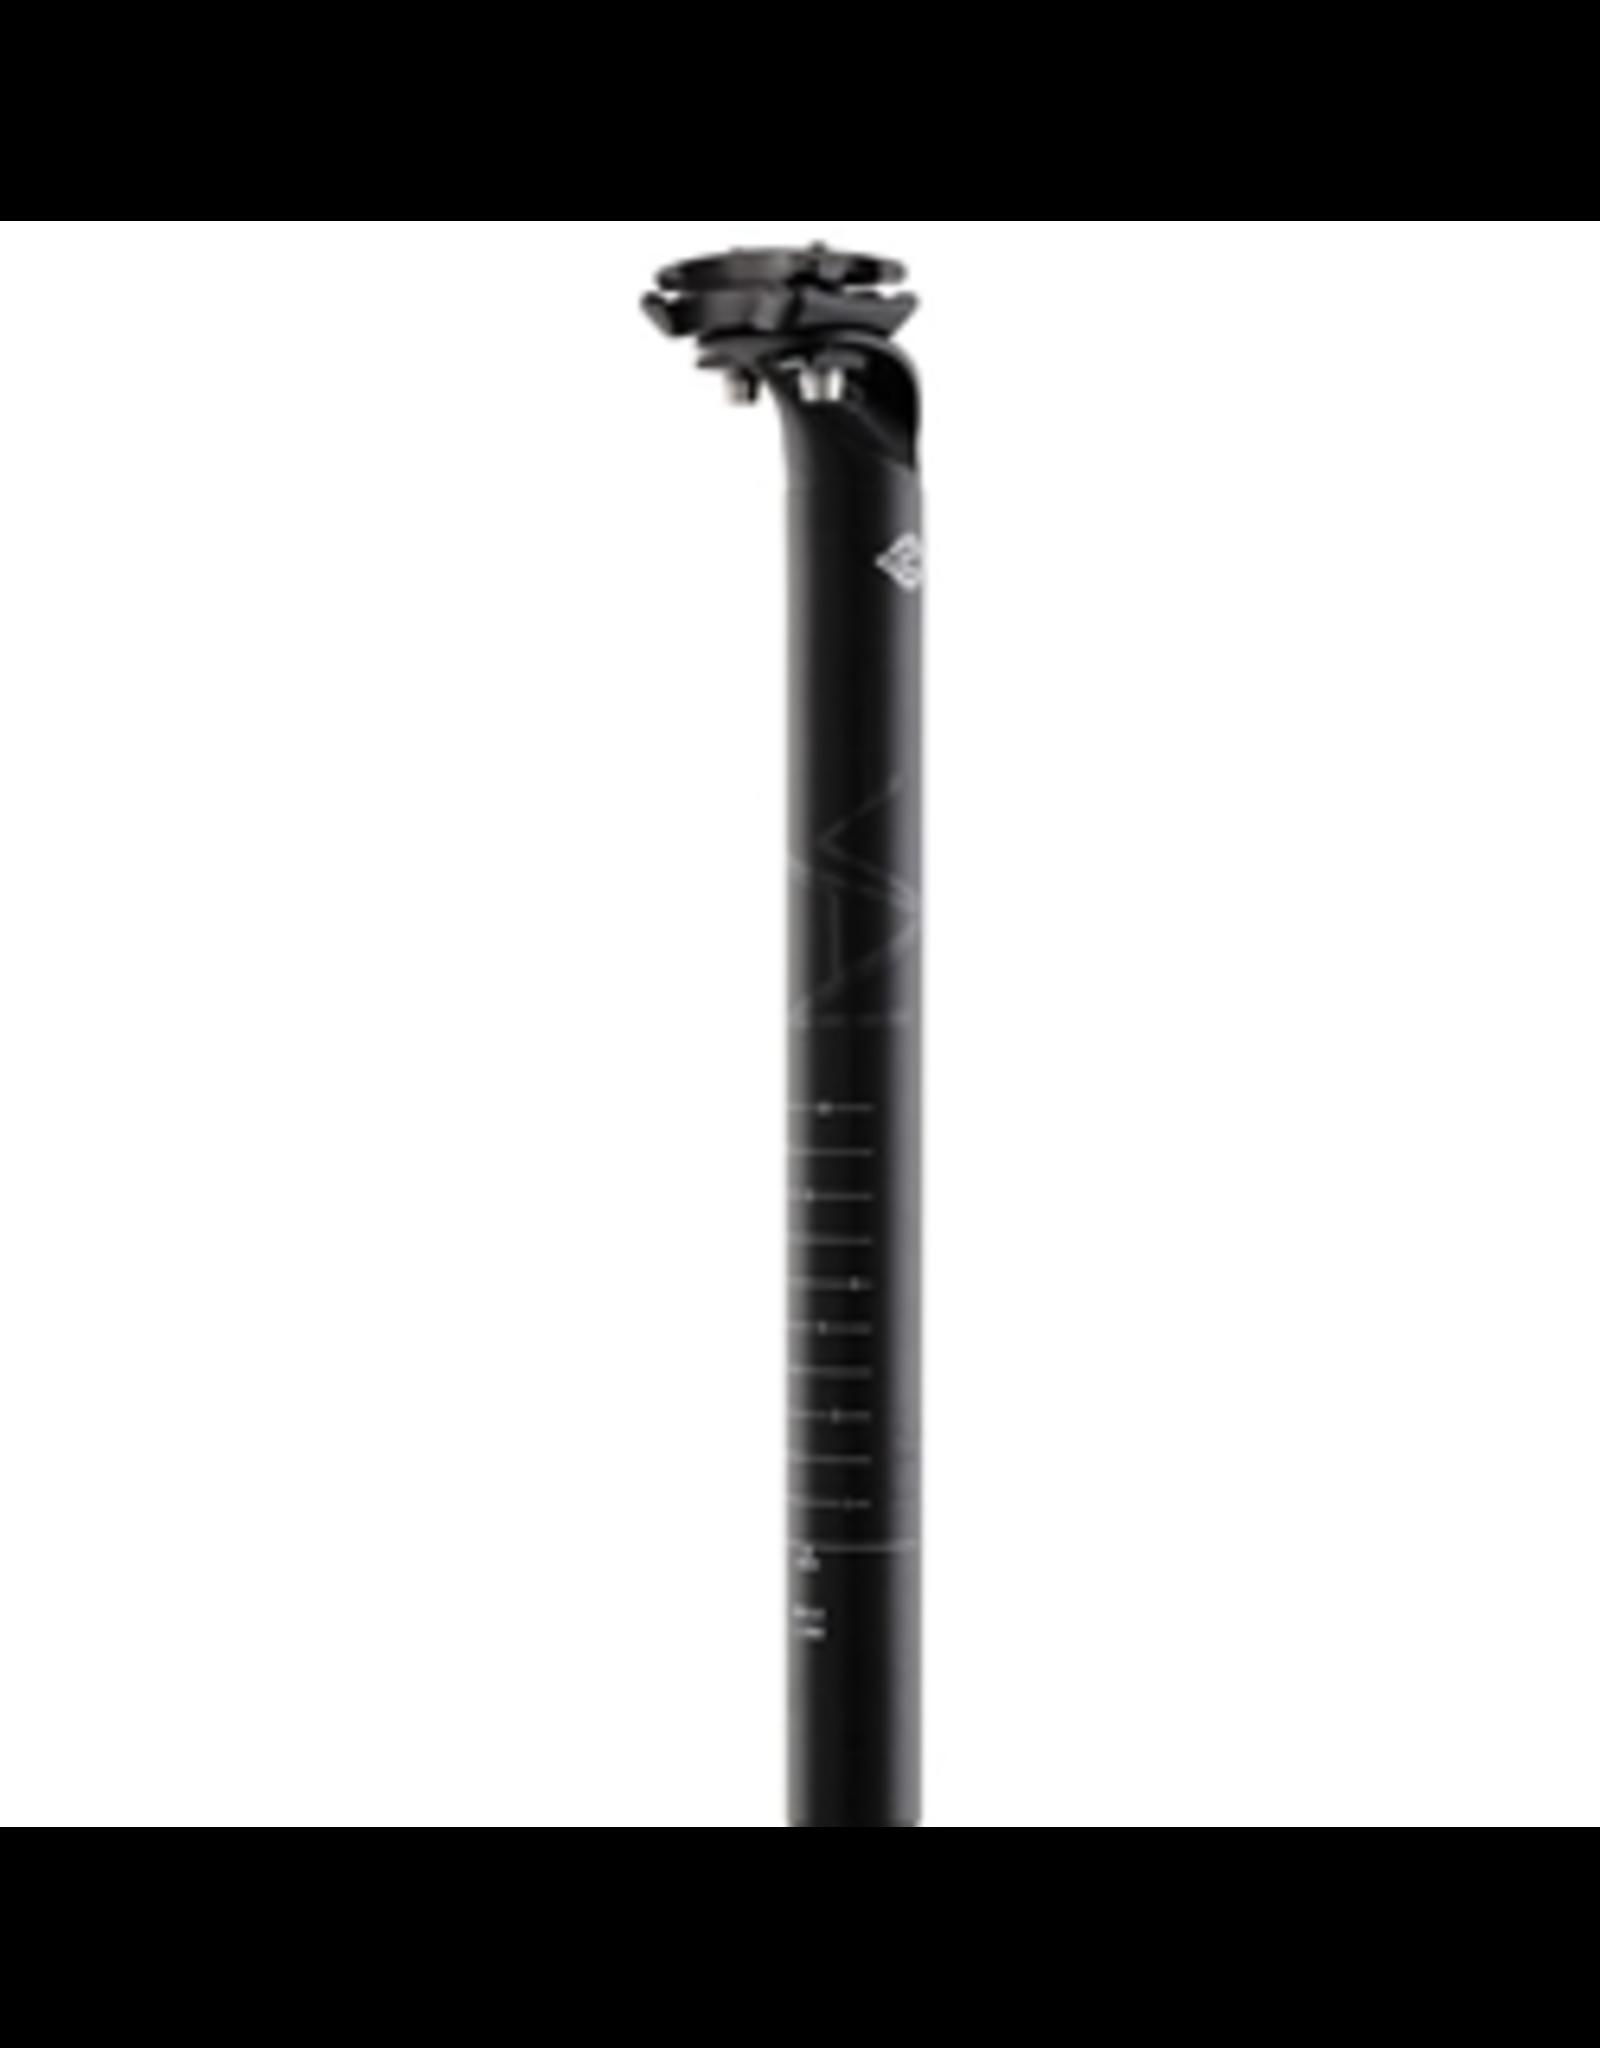 Cinelli Vai Seatpost, 350 x 31.6mm - Black